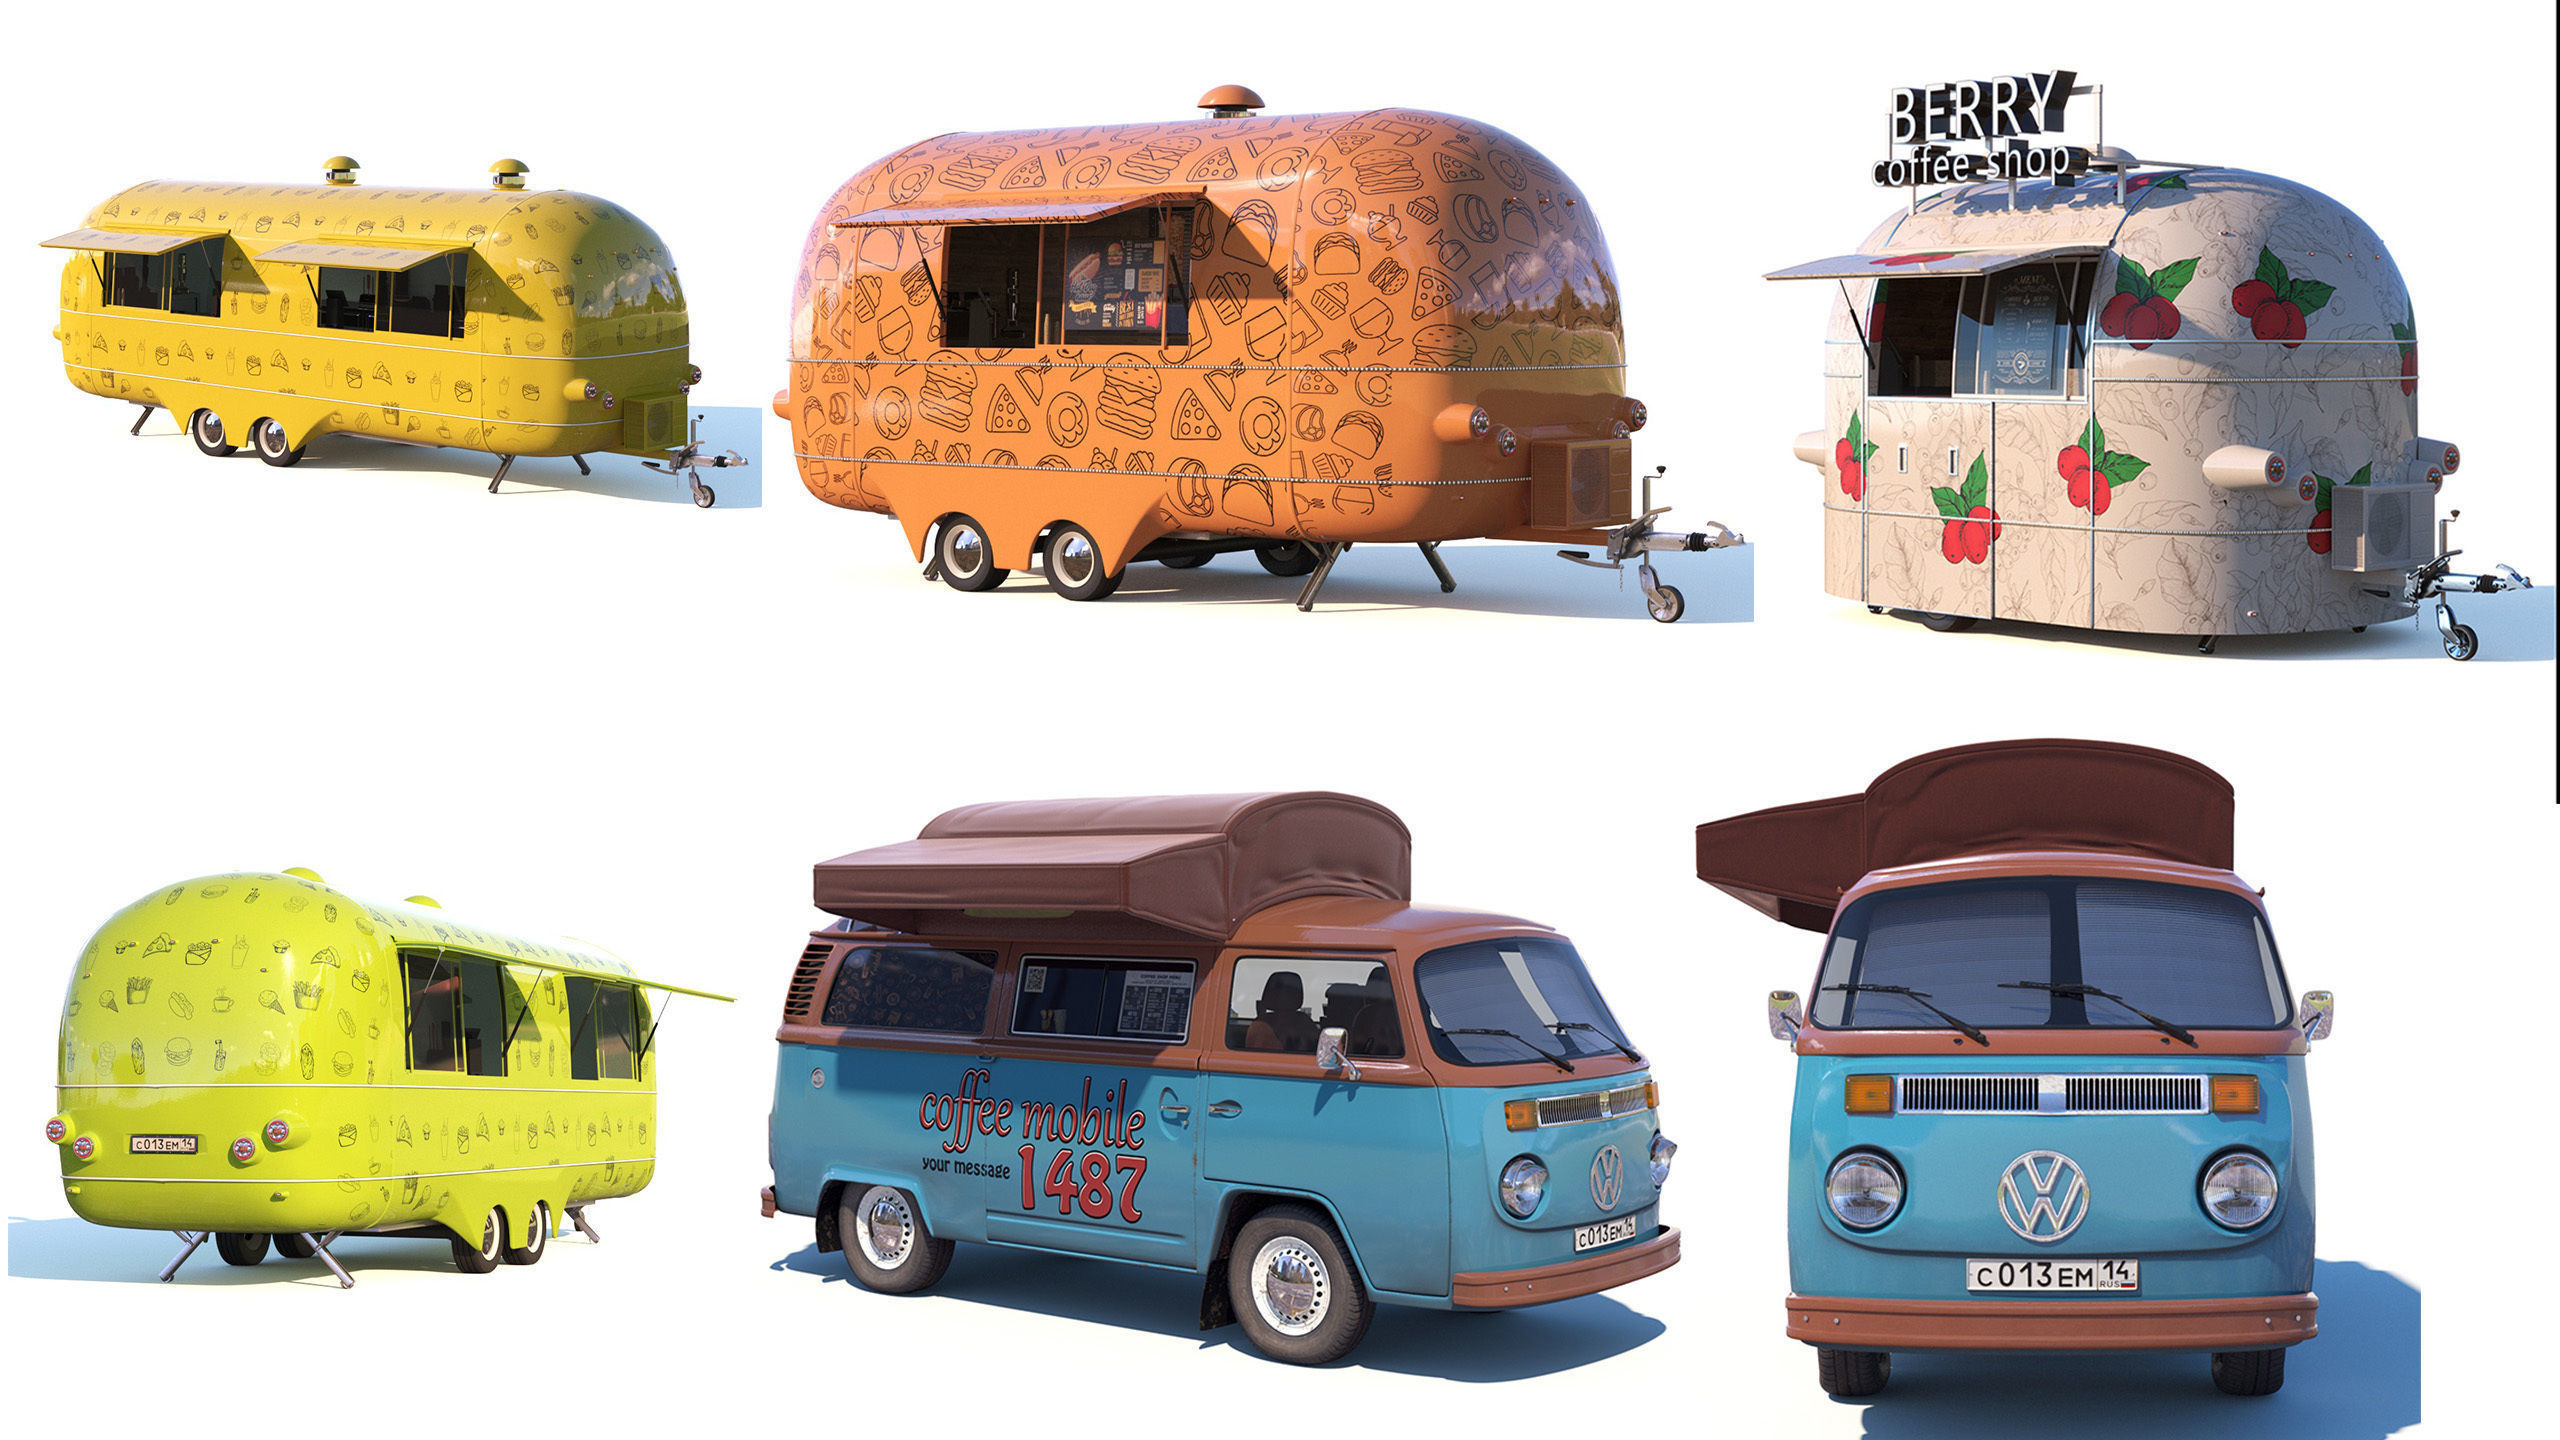 Street food and coffee  trucks